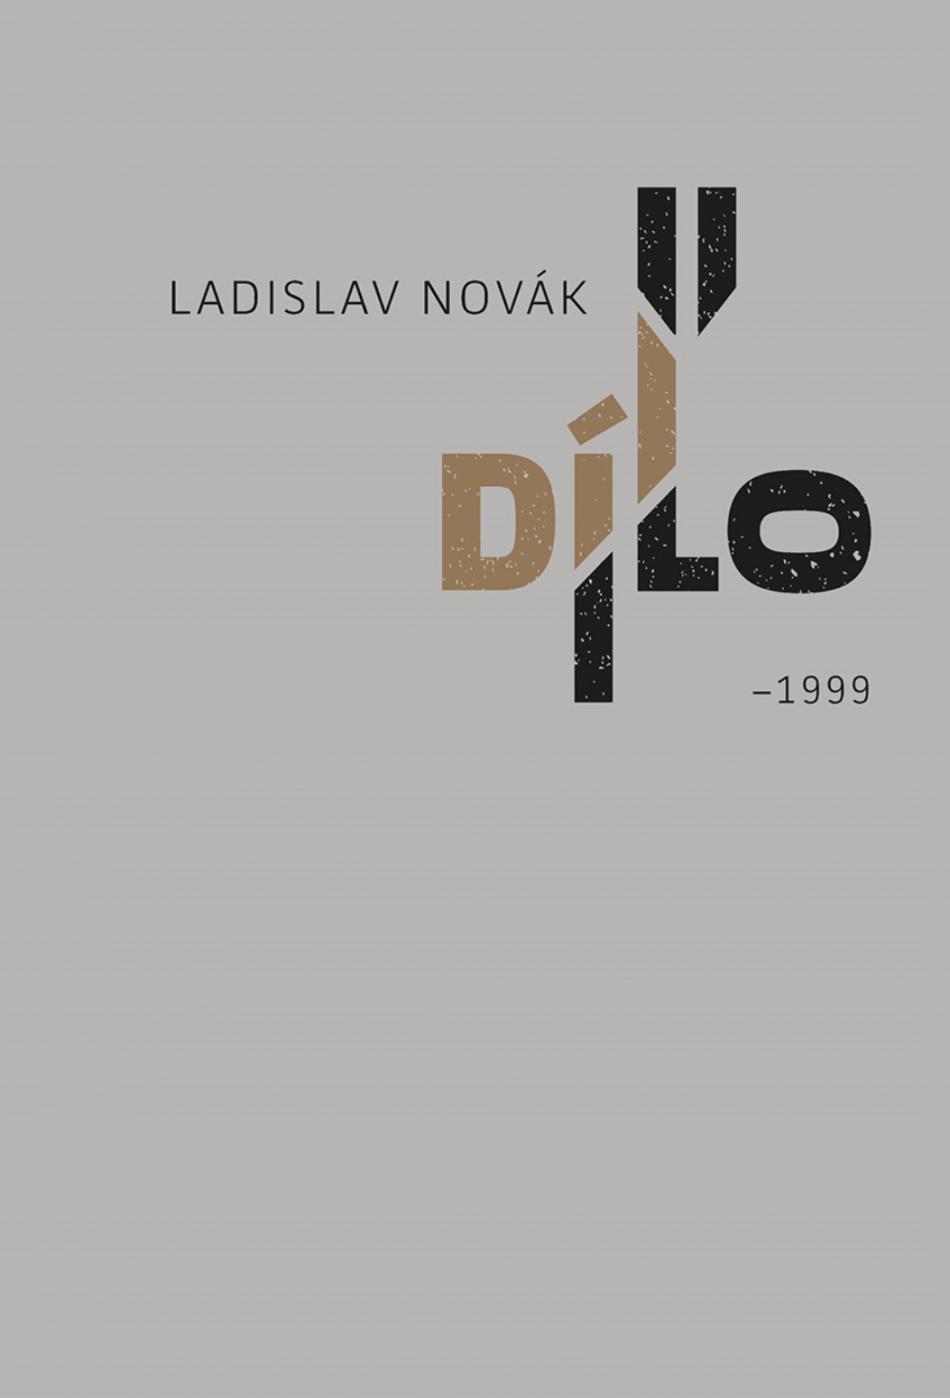 Ladislav Novák / Dílo